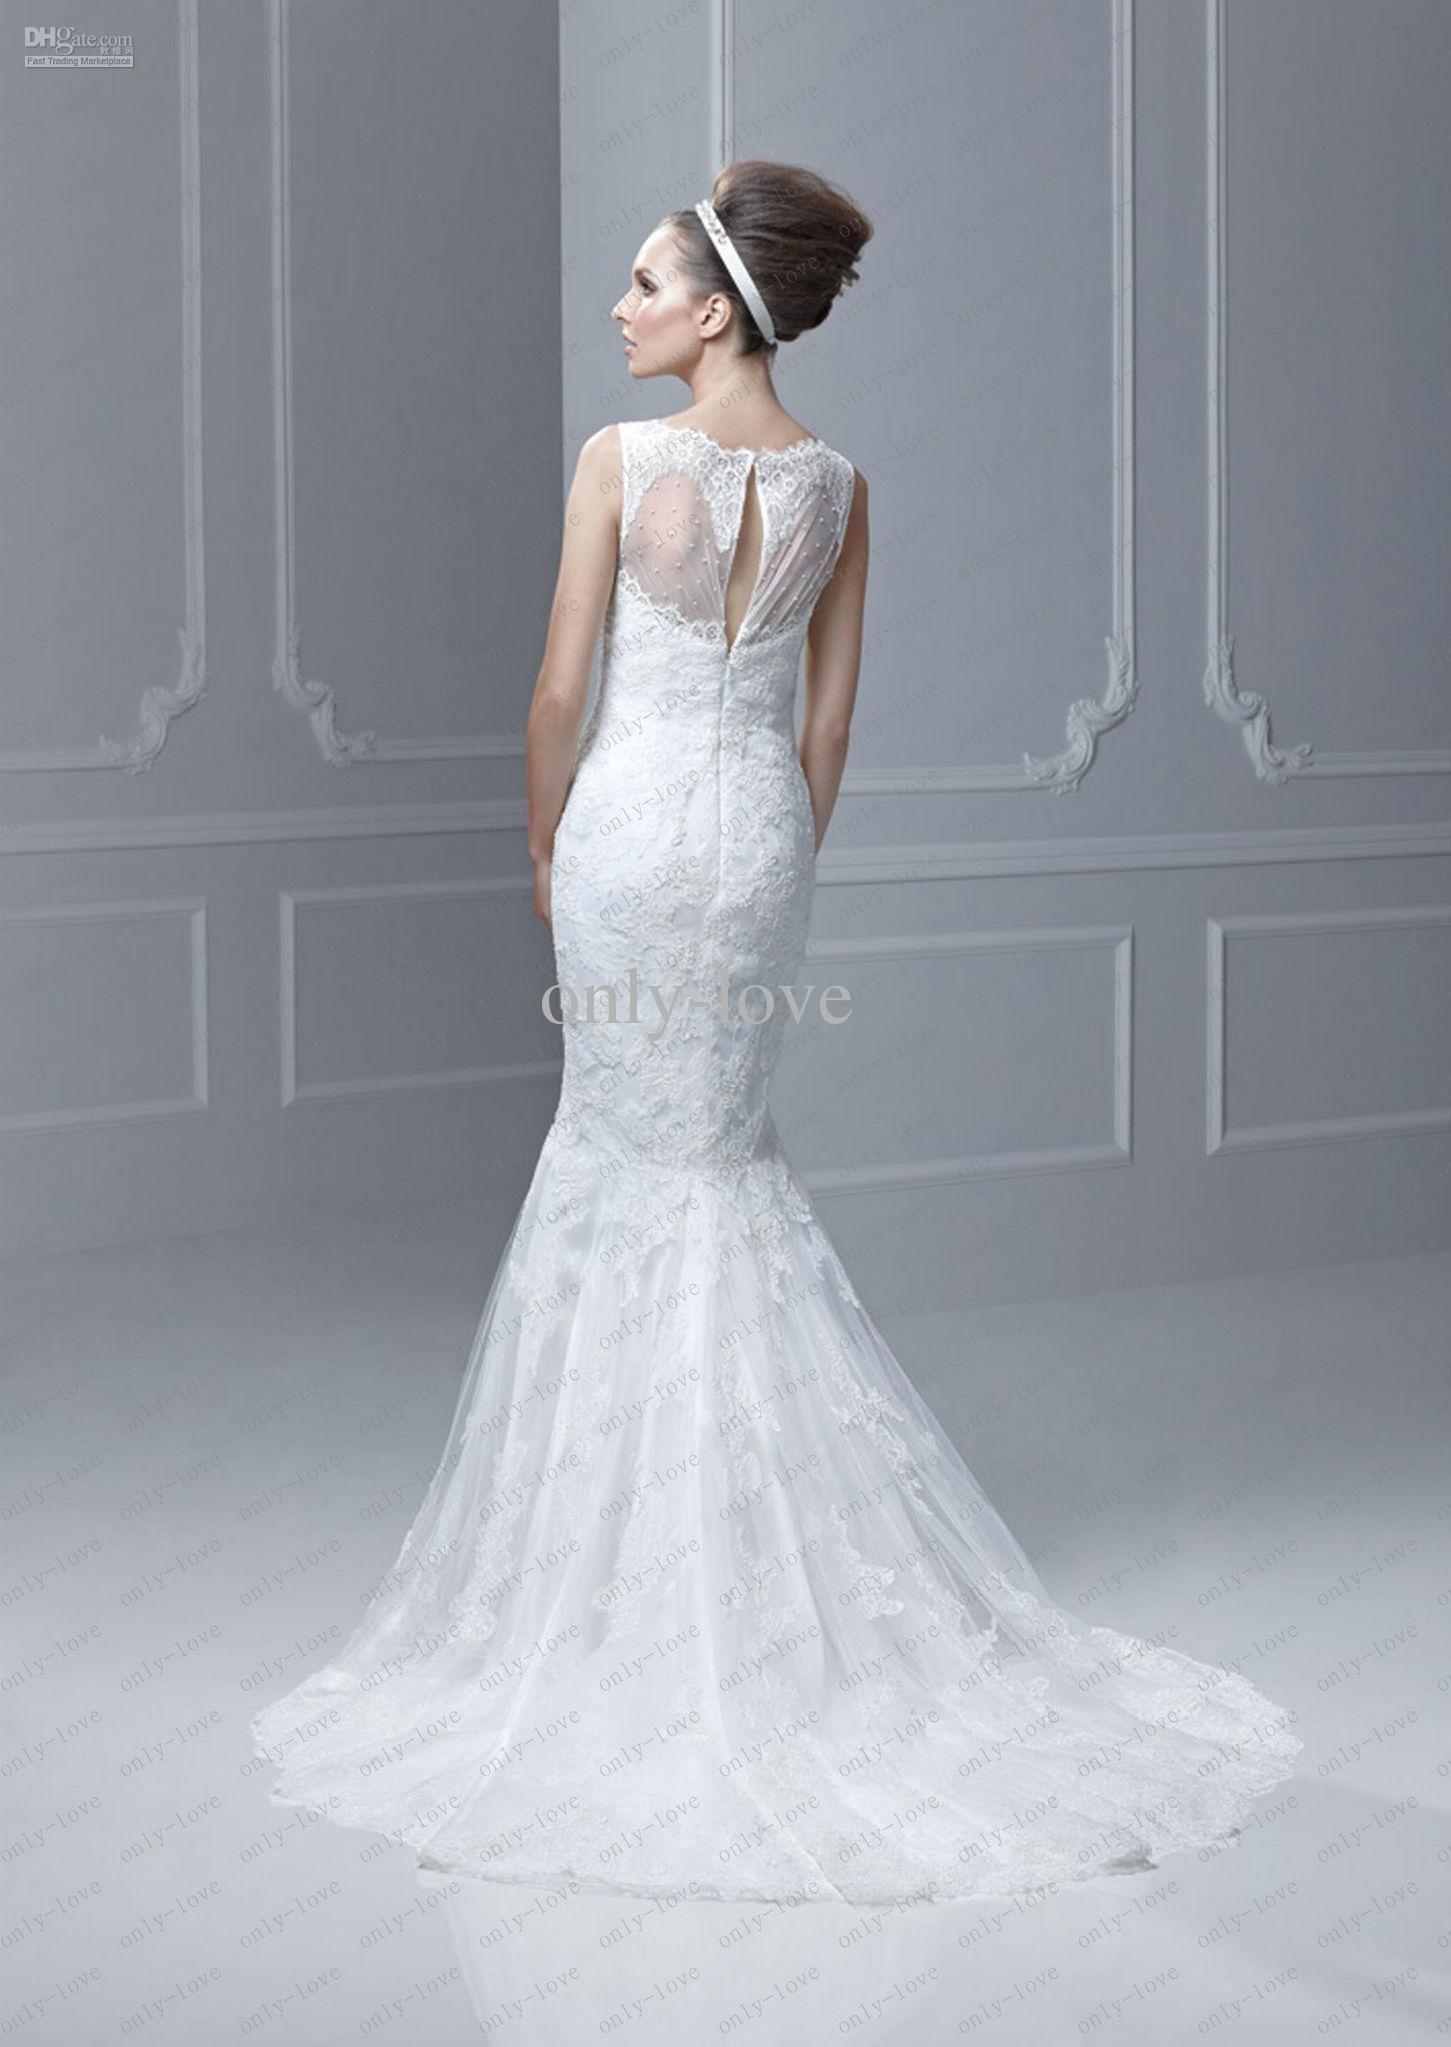 Bateau wedding dress with hair up - Google Search